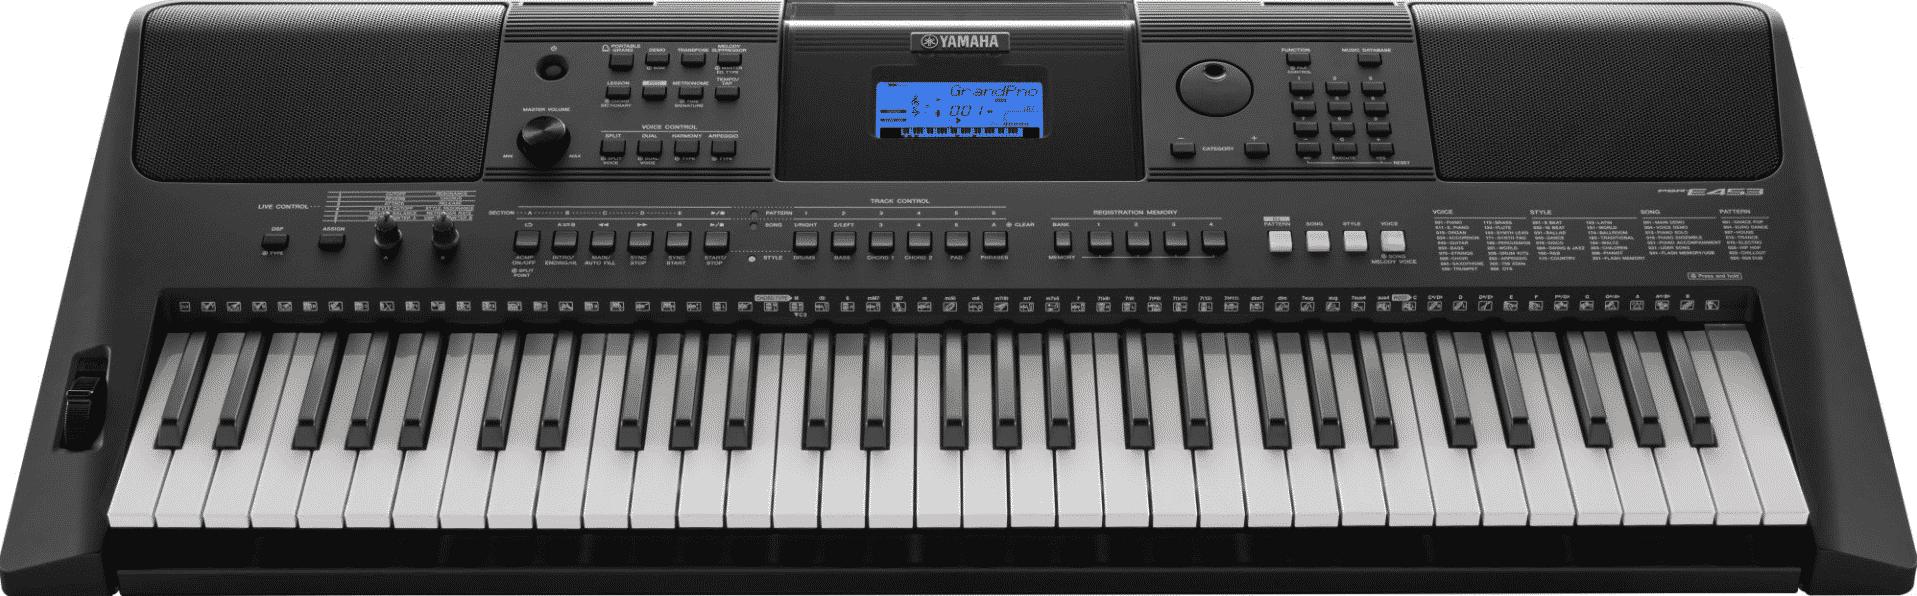 Yamaha PRS E453